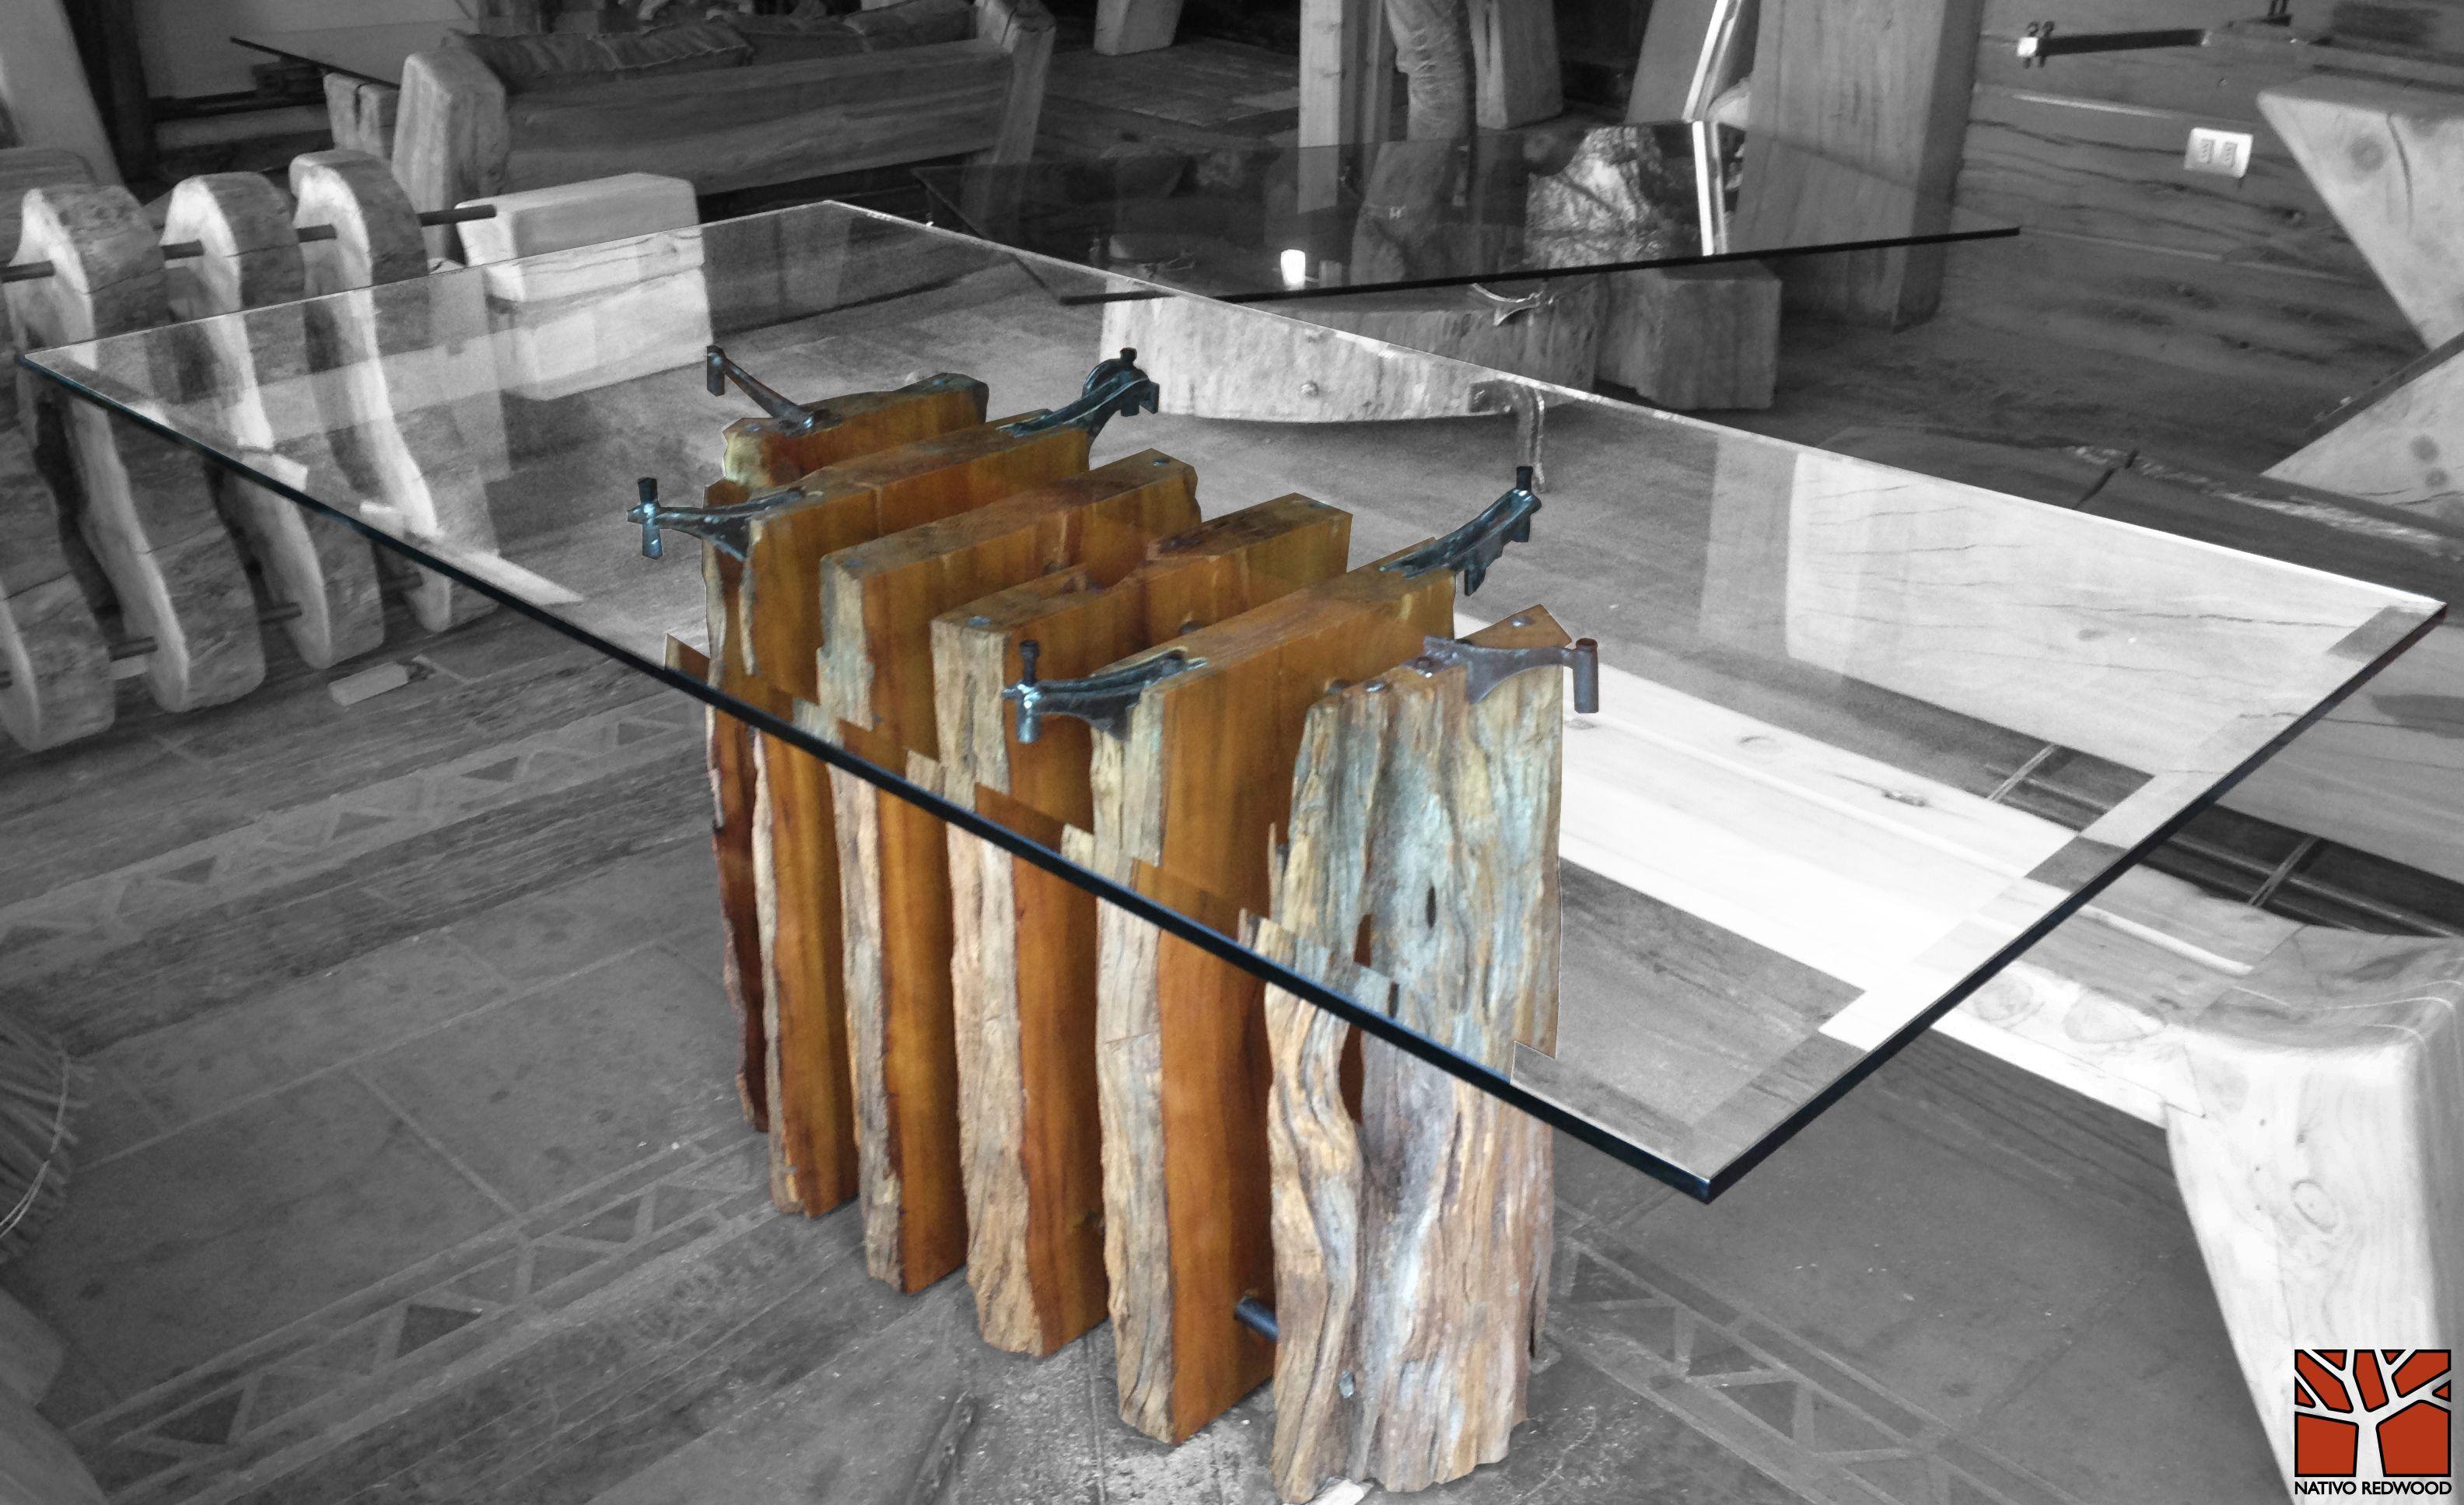 Nativo redwood mesa comedor con base de tronco de madera - Mesas de troncos de madera ...